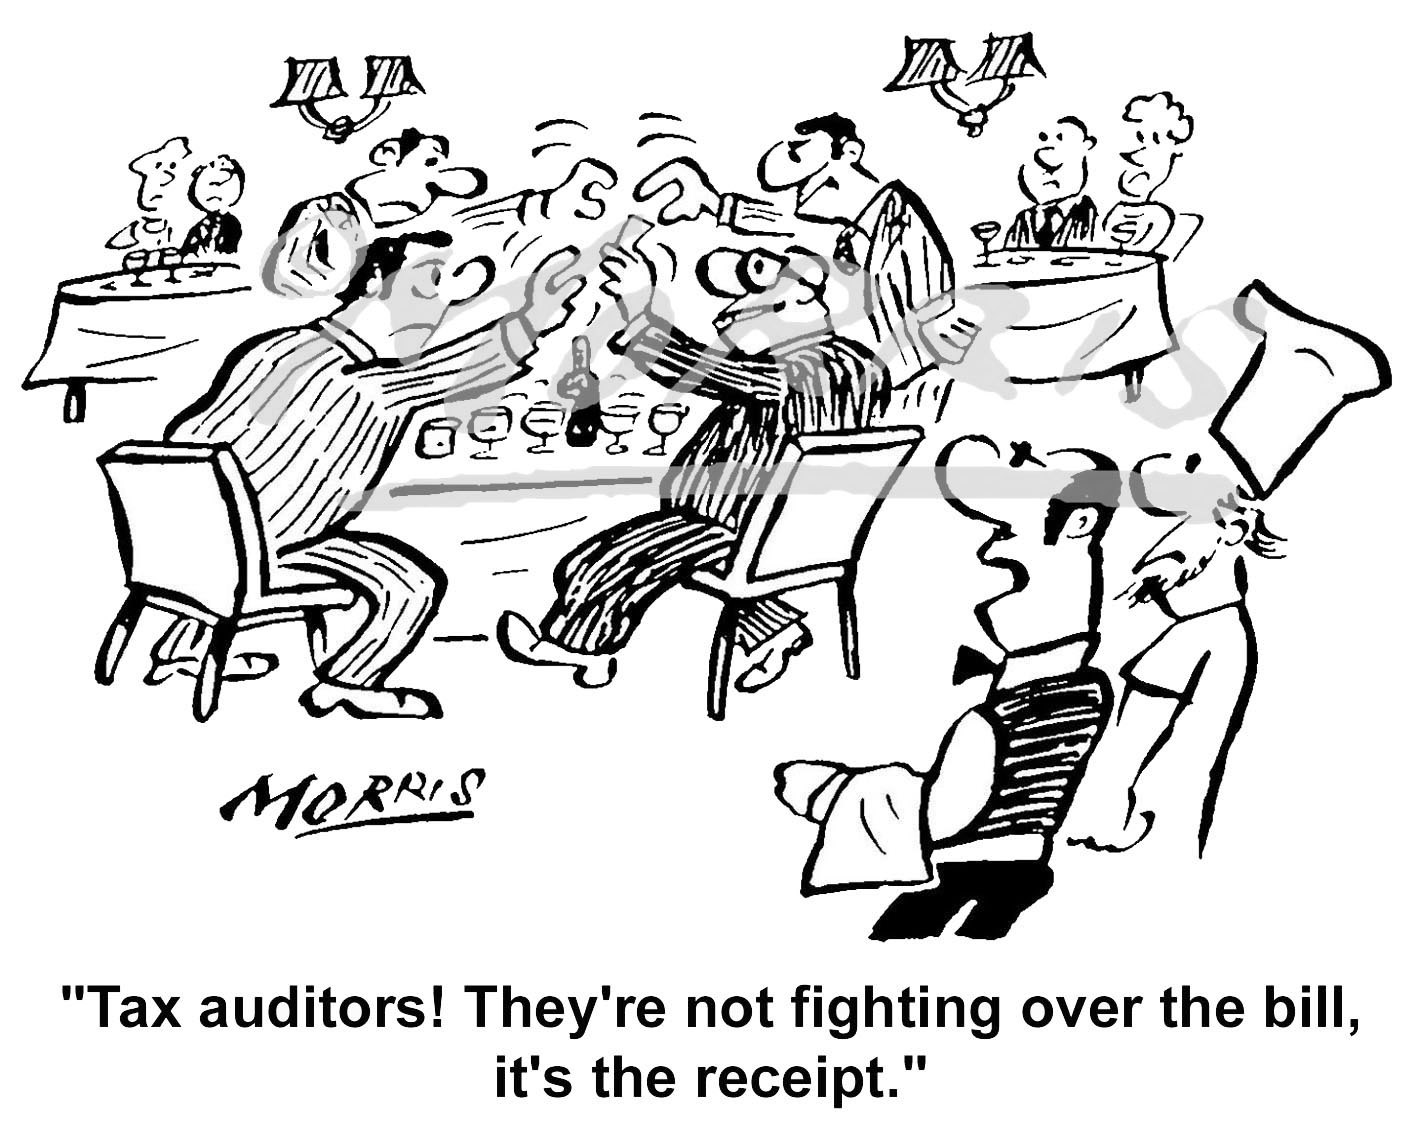 Tax Auditor receipt comic cartoon Ref: 4257bwus